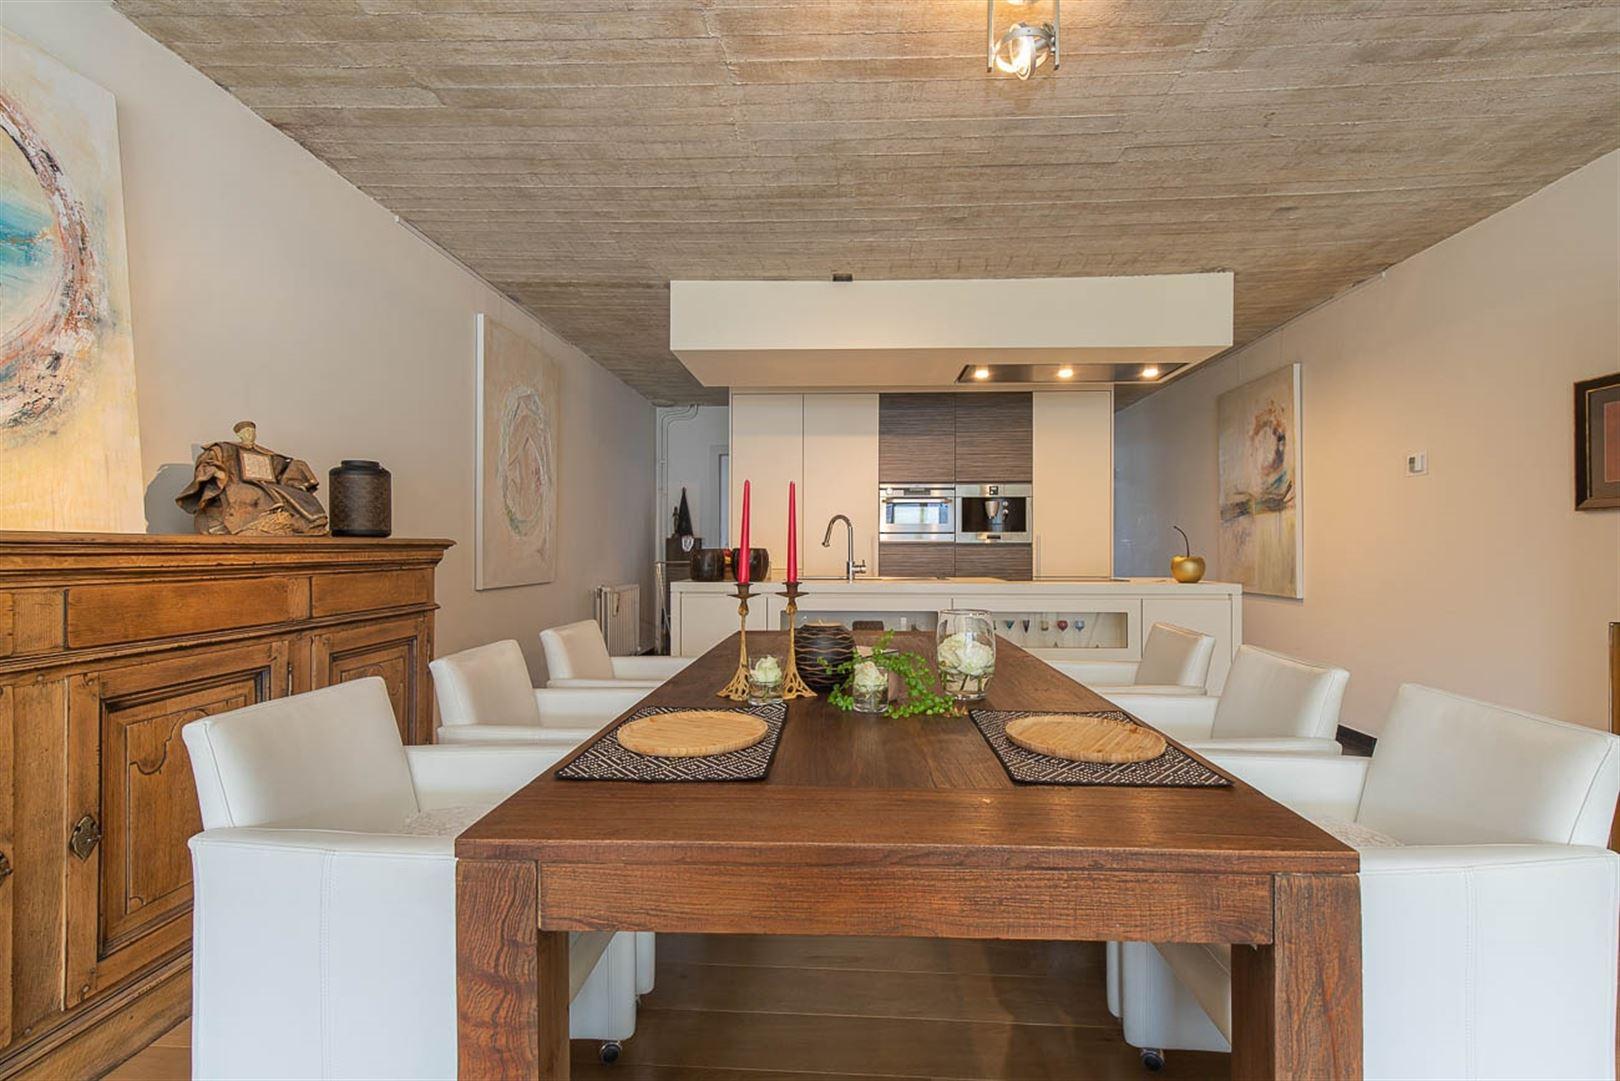 Foto 7 : Duplex/triplex te 9200 DENDERMONDE (België) - Prijs € 495.000